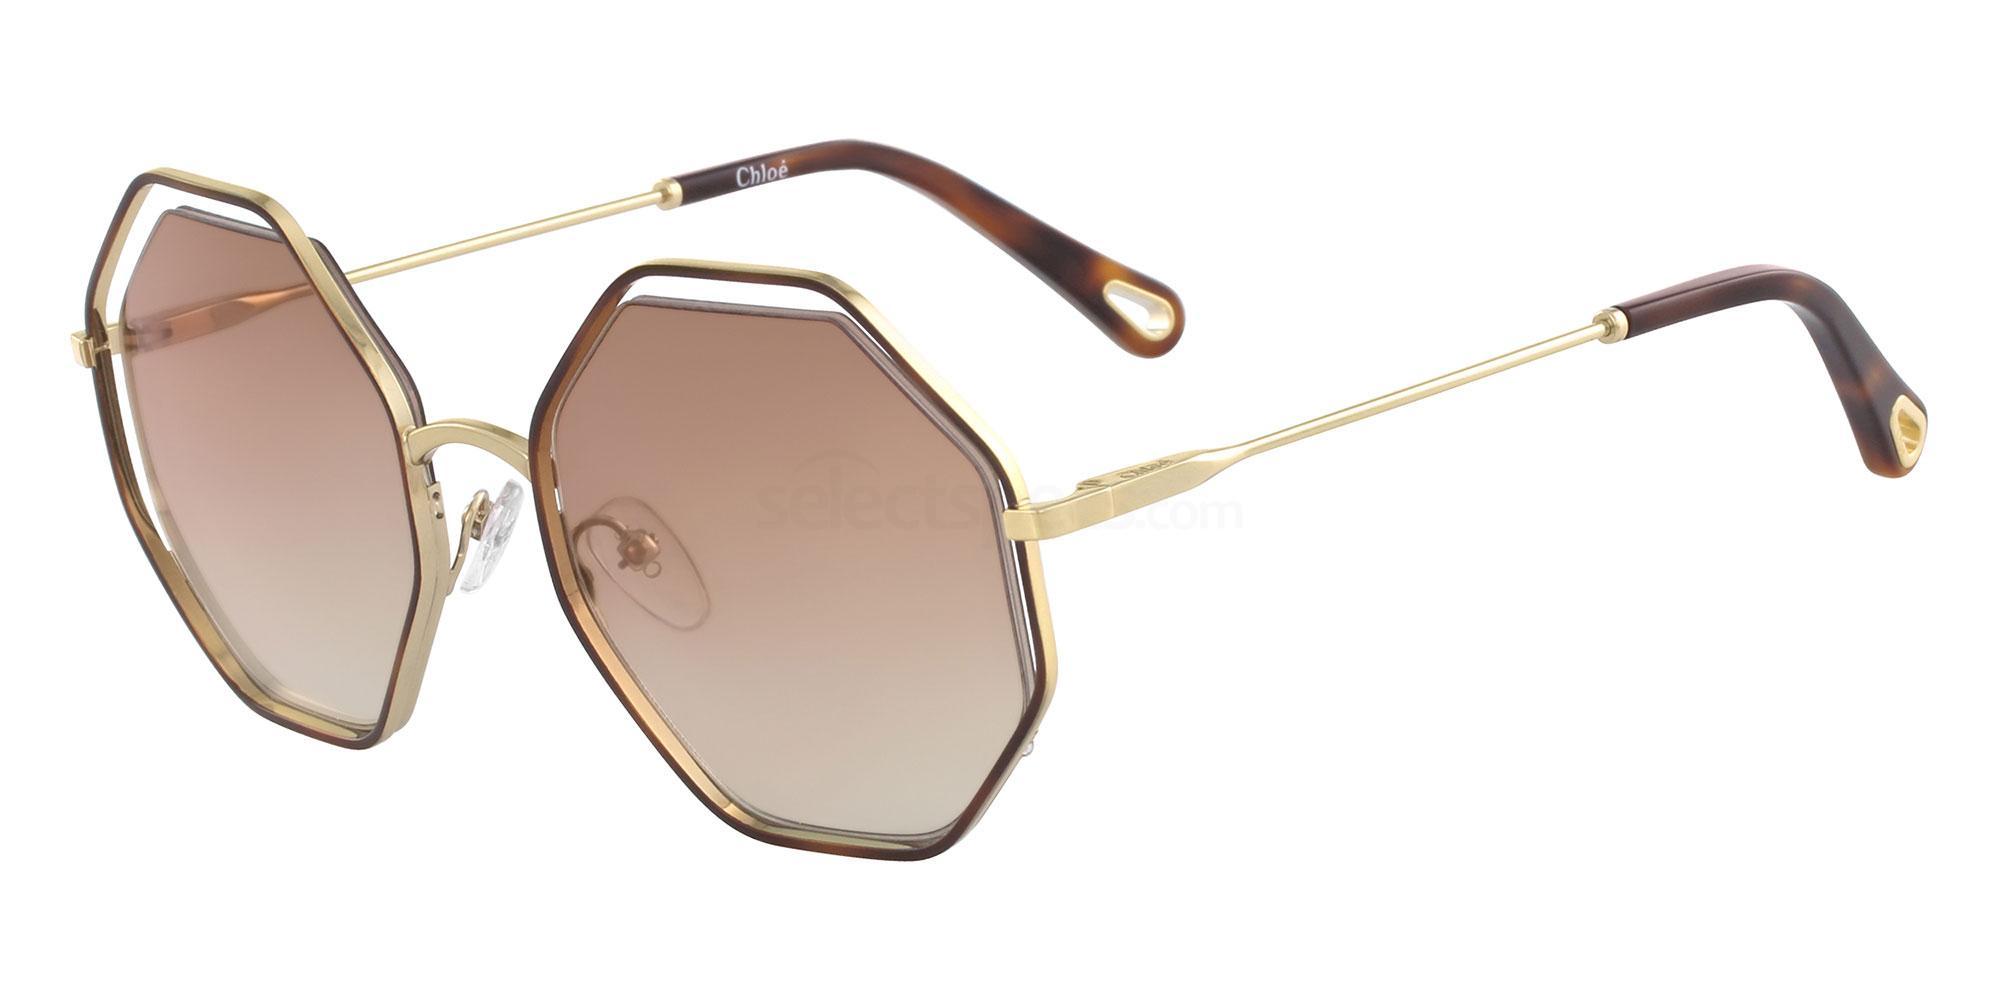 205 CE132S Sunglasses, Chloe